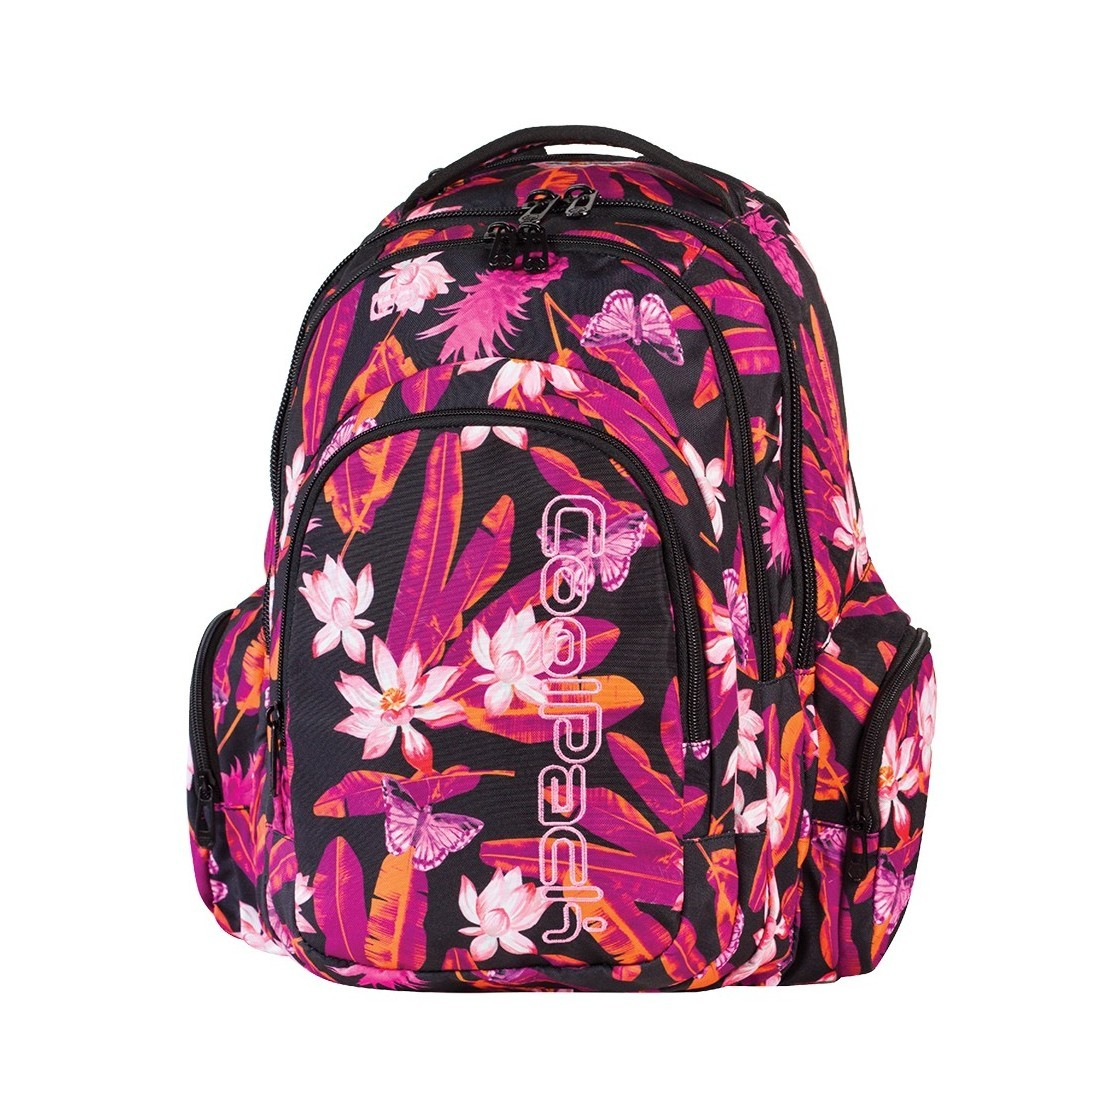 Plecak młodzieżowy CoolPack SPARK 3 przegrody TAHITI CP 566 - plecak-tornister.pl